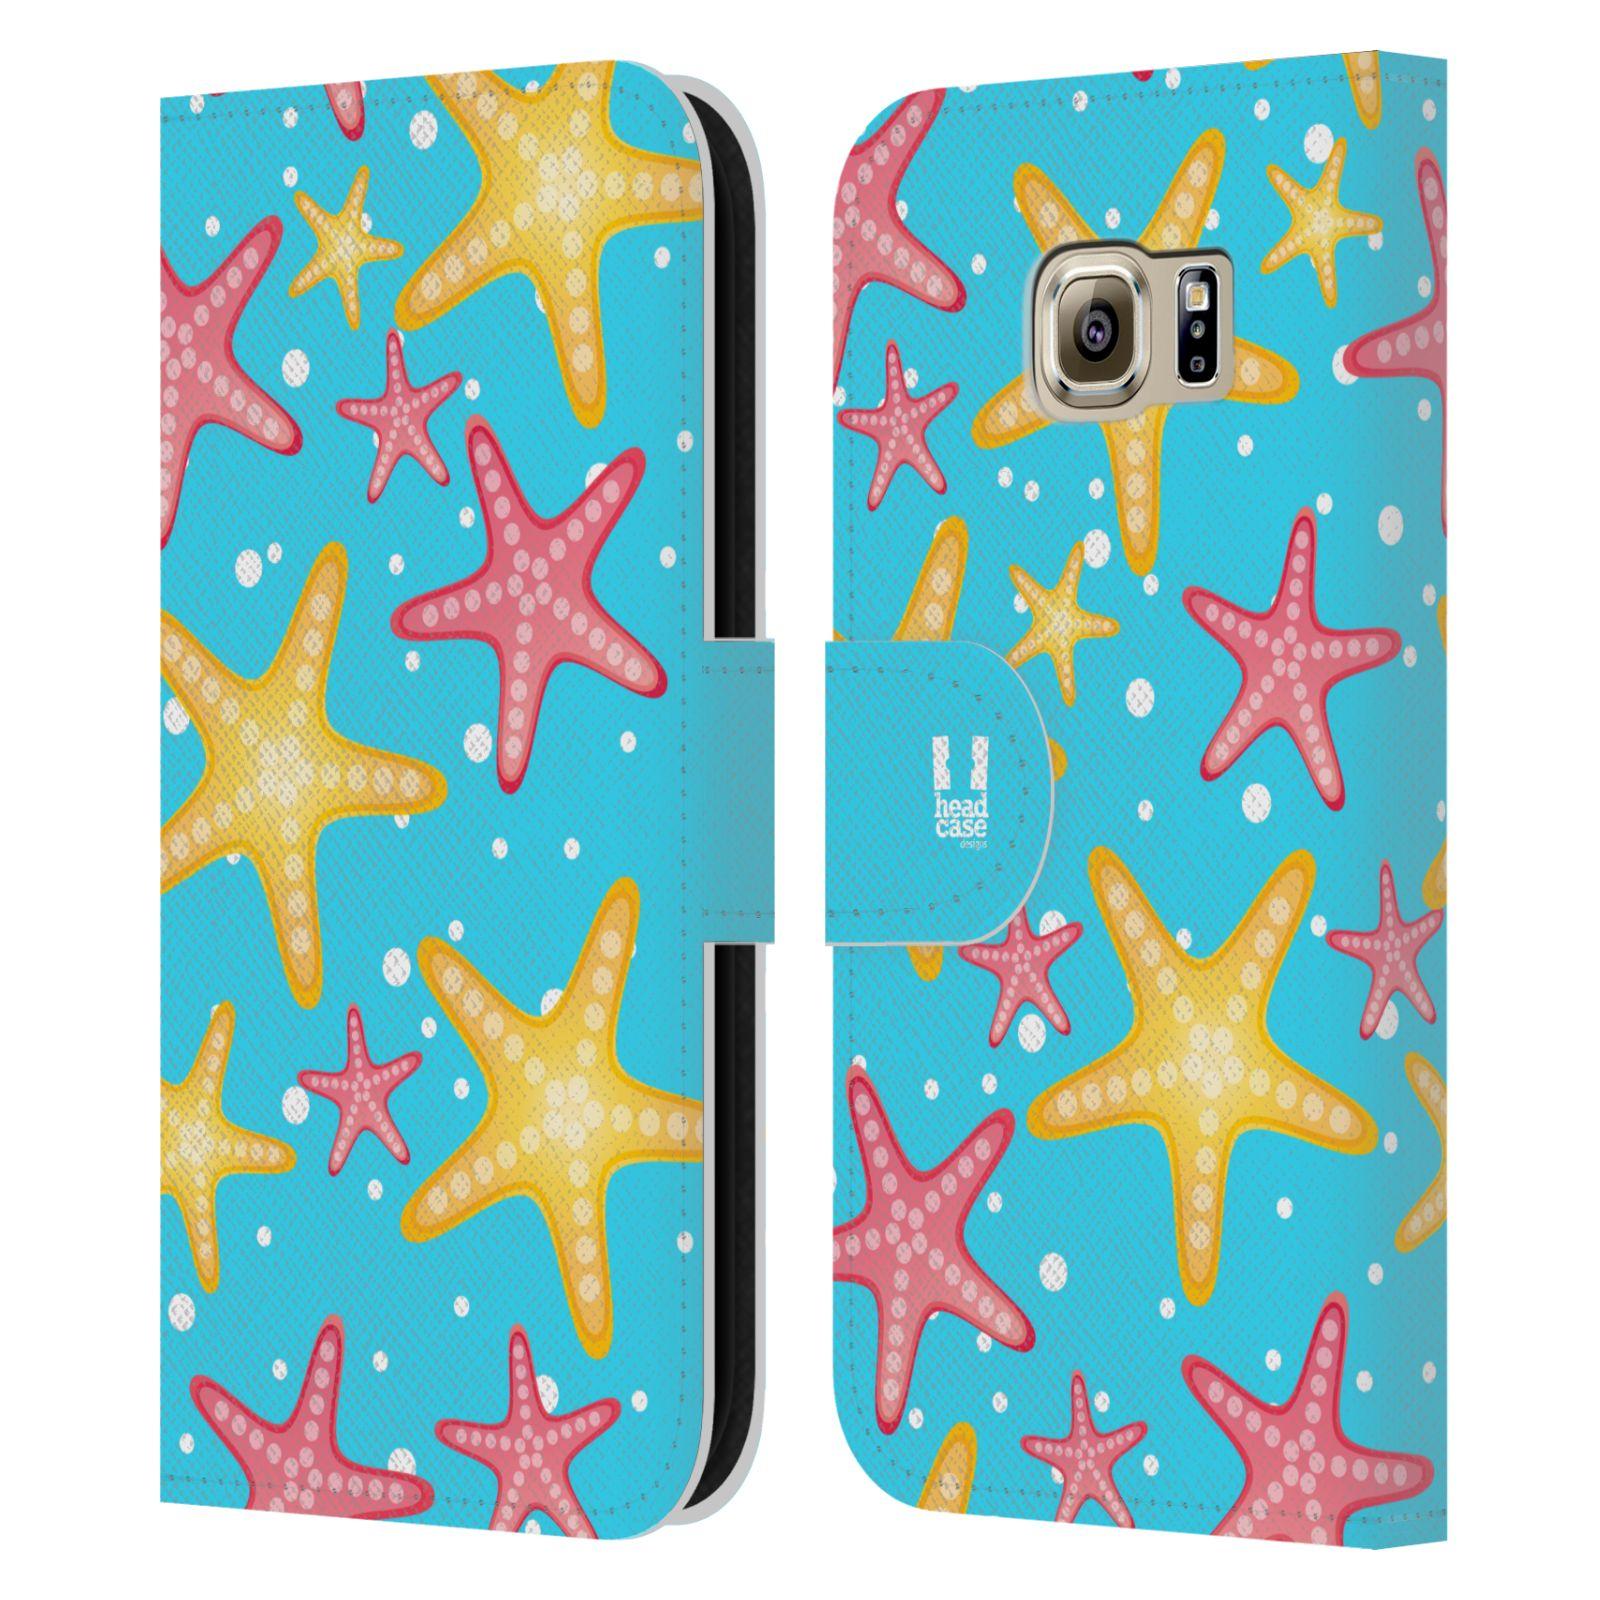 HEAD CASE Flipové pouzdro pro mobil Samsung Galaxy S6 (G9200) Mořský živočich hvězdice modrá barva pozadí